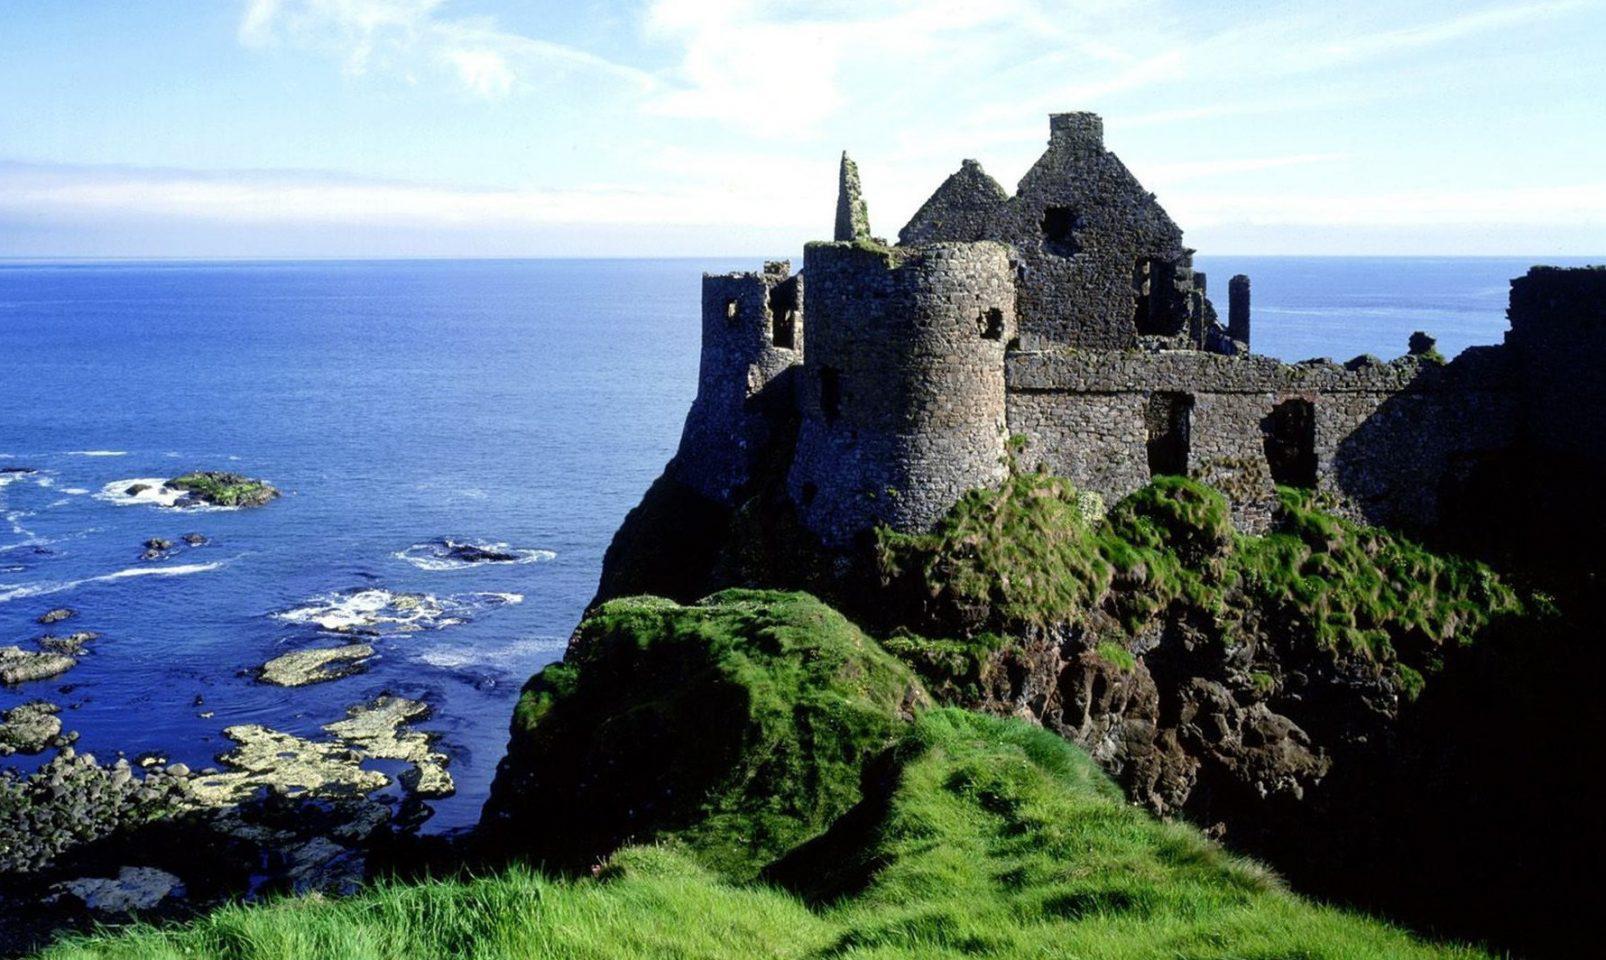 irlandia1-1 15 μέρη που αξίζει να επισκεφτείς μέσα στο 2017